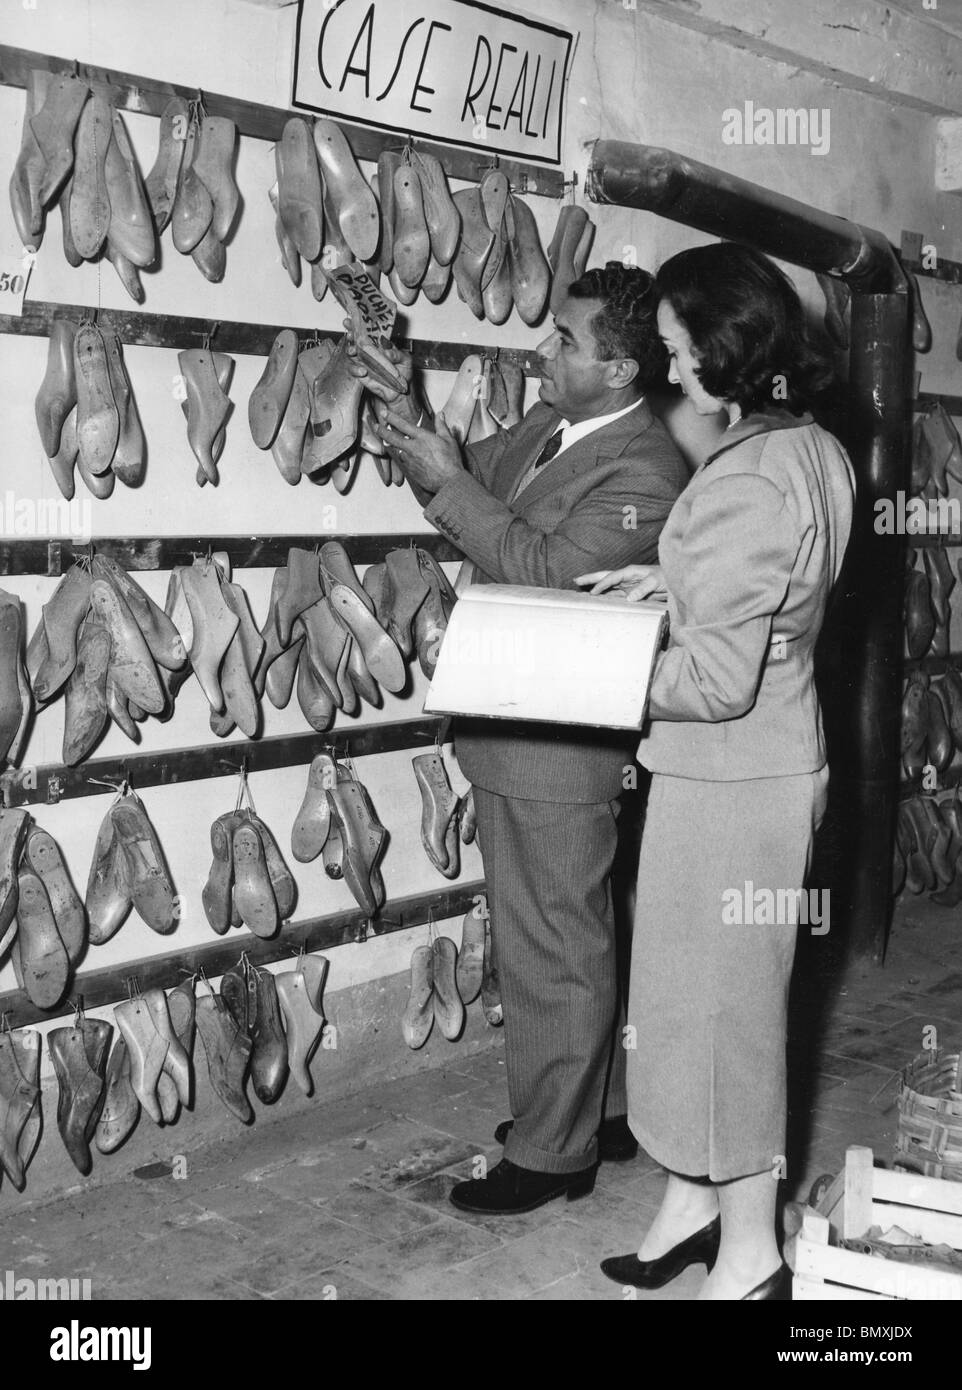 SALVATORE FERRAGAMO (1898-1960) Italian shoe designer at his Via Manelli workshop in Florence about 1955 - Stock Image